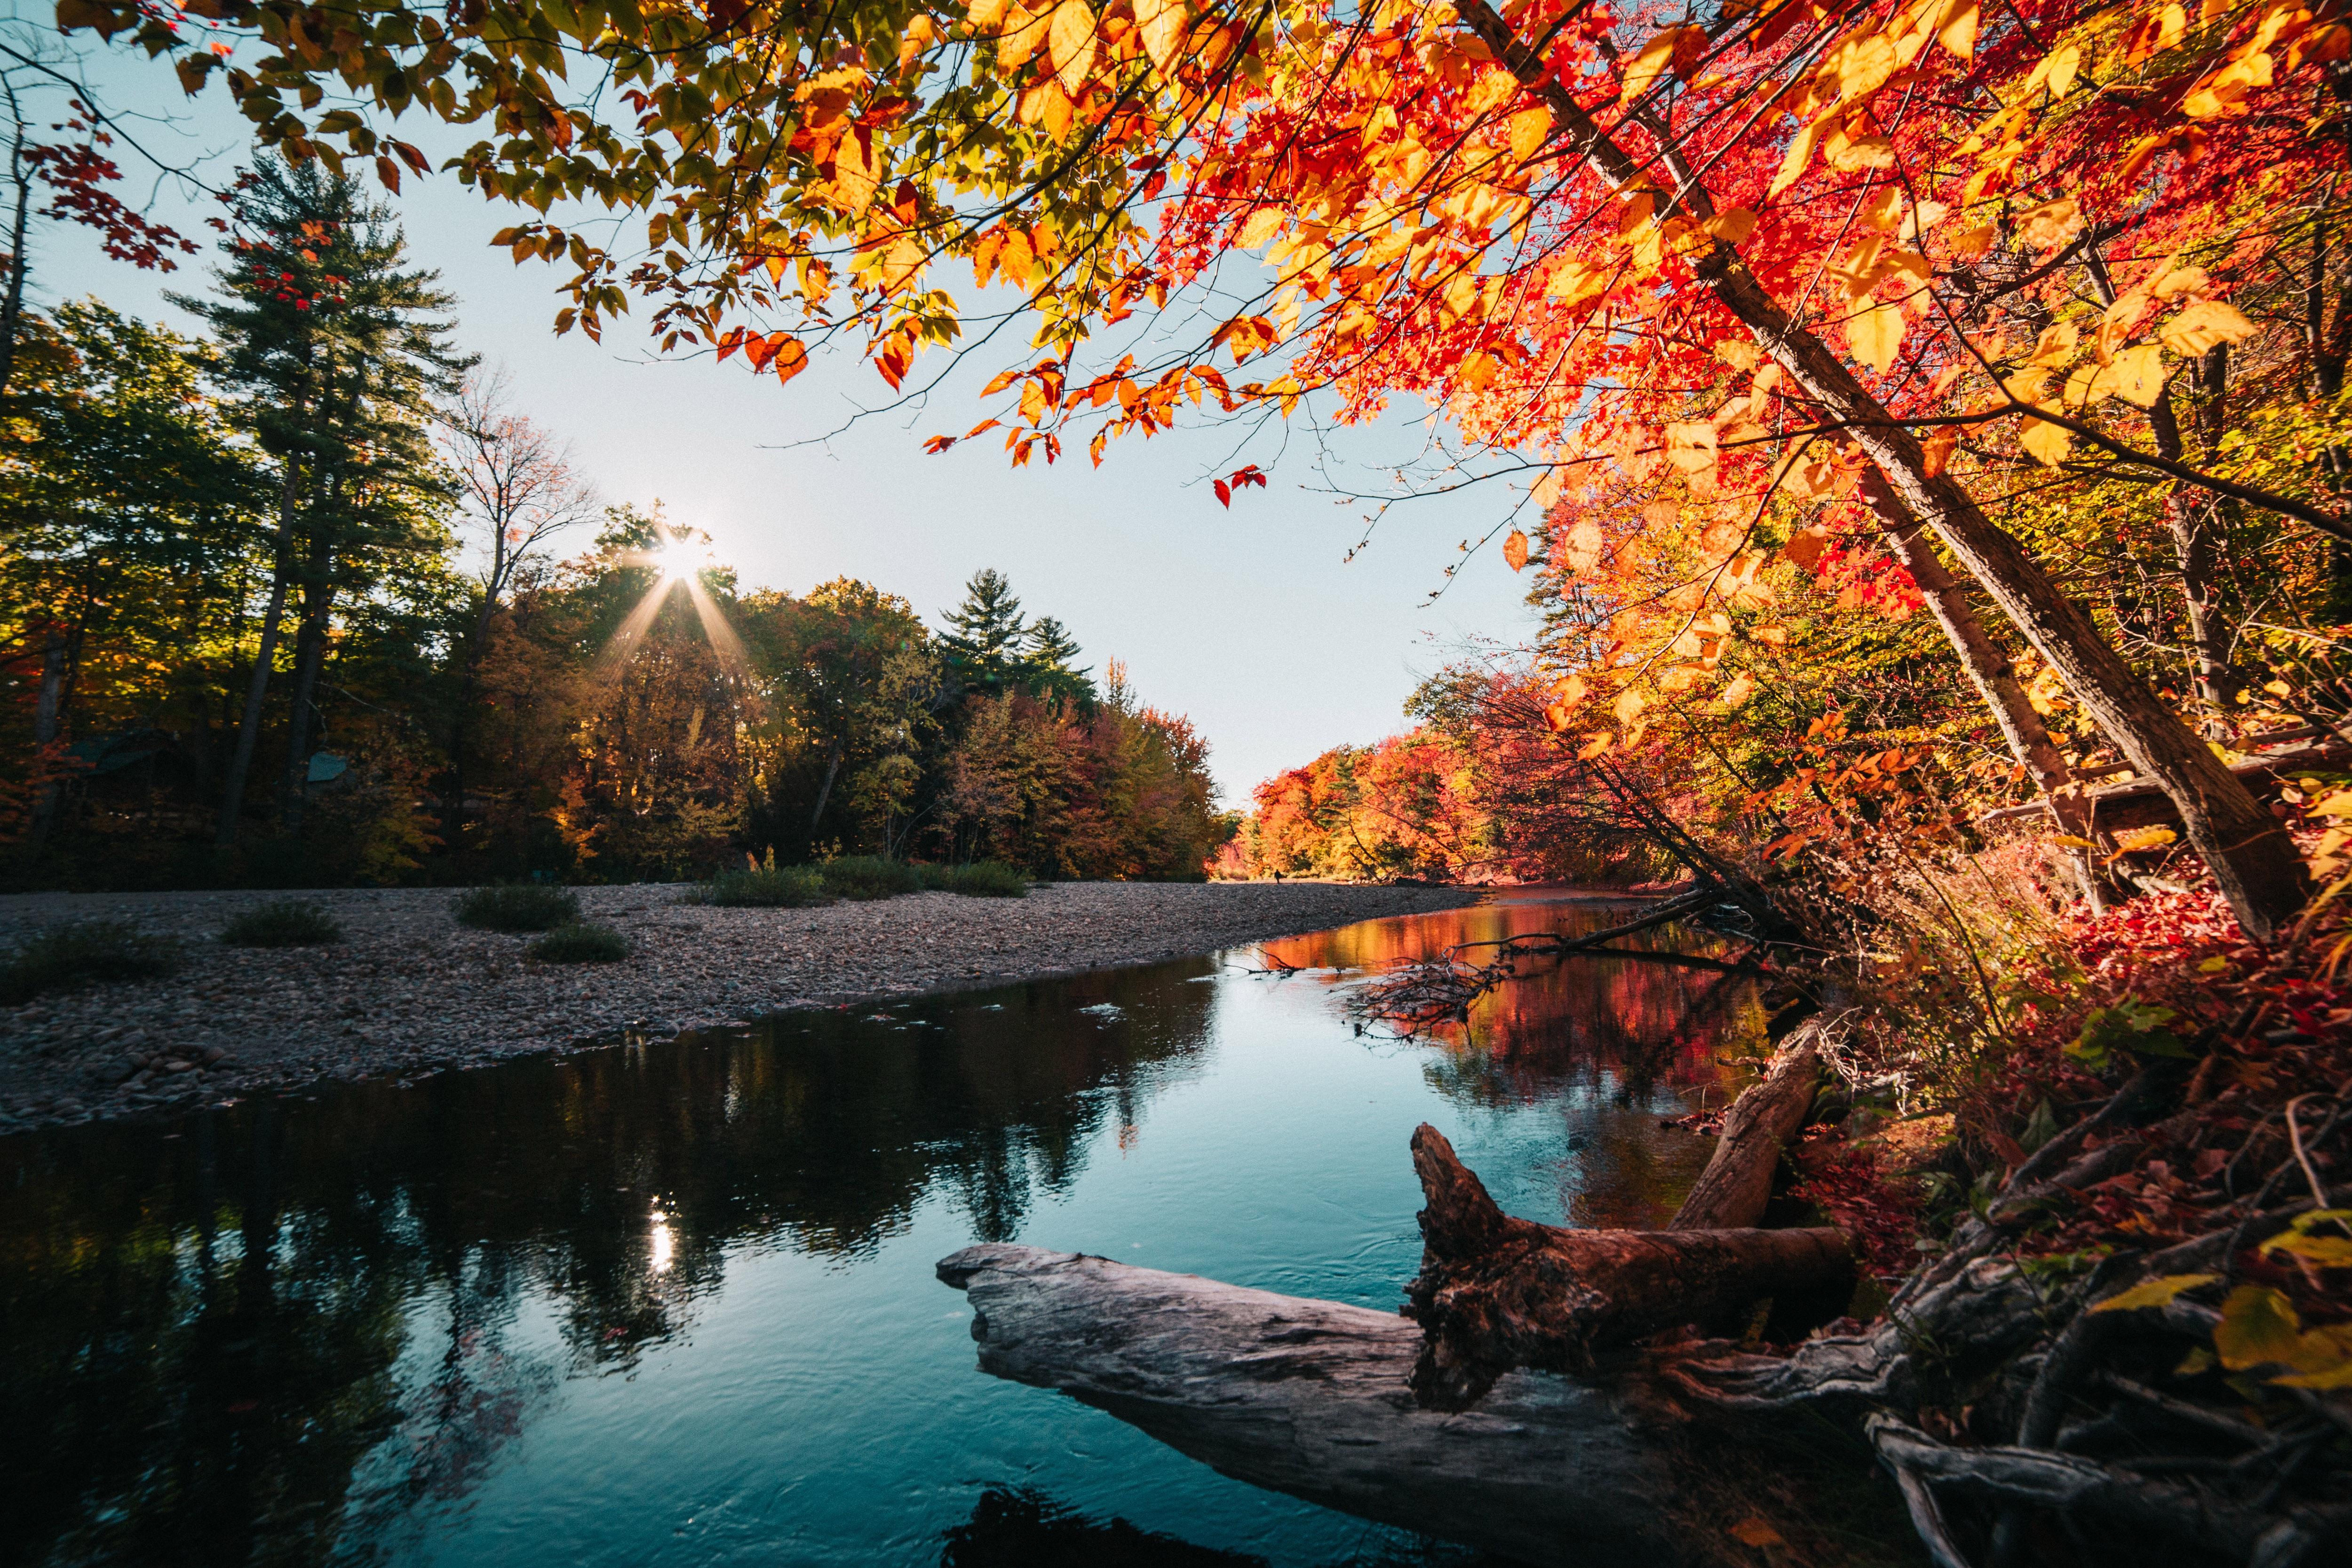 Calm River in the Autumn Free Photo - ISO Republic